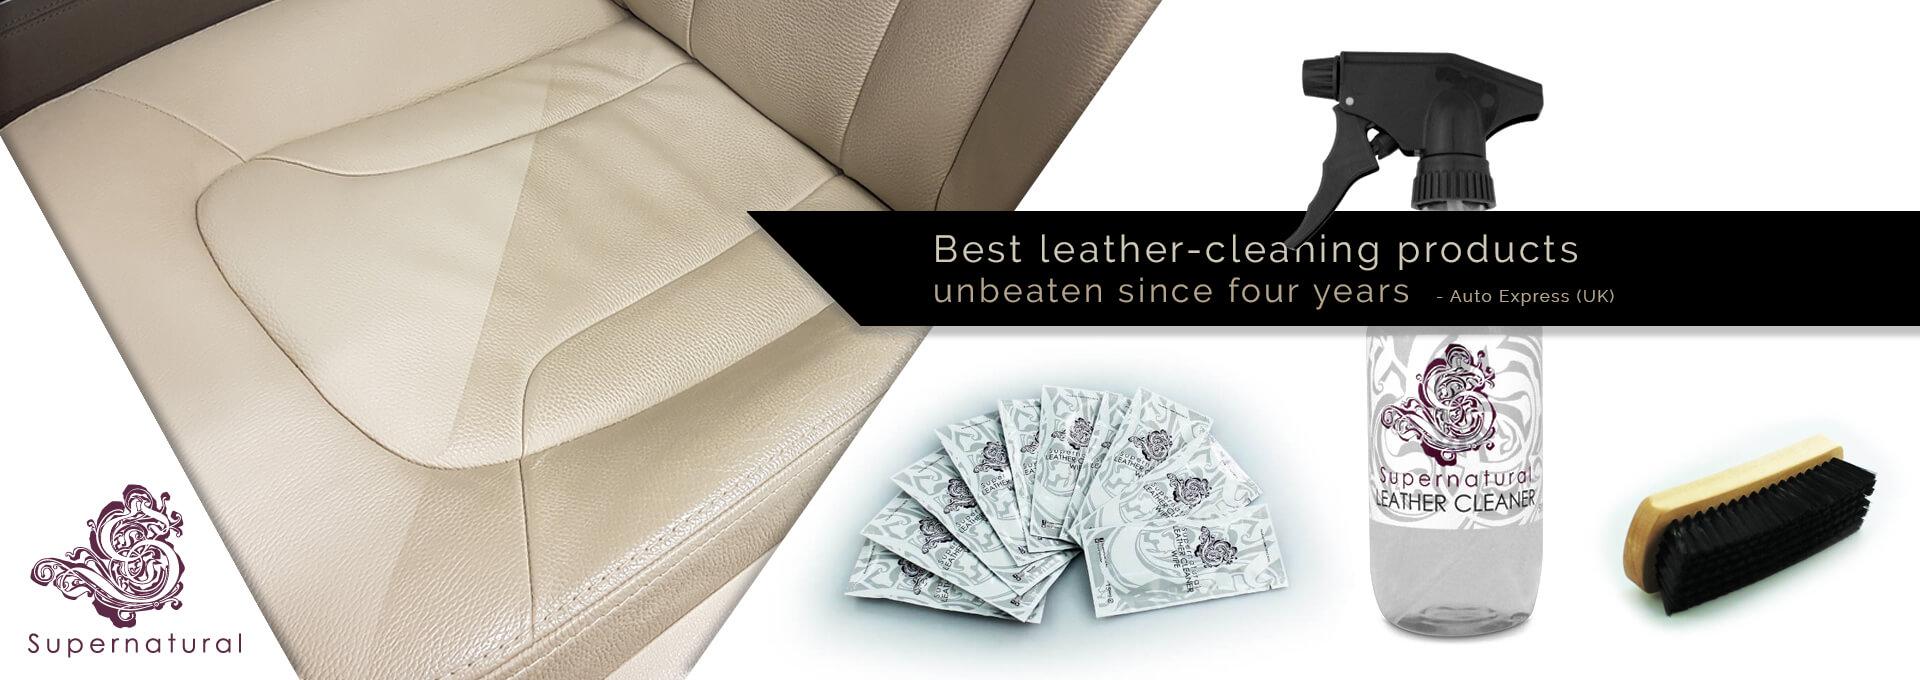 Supernatural Leather Cleaner